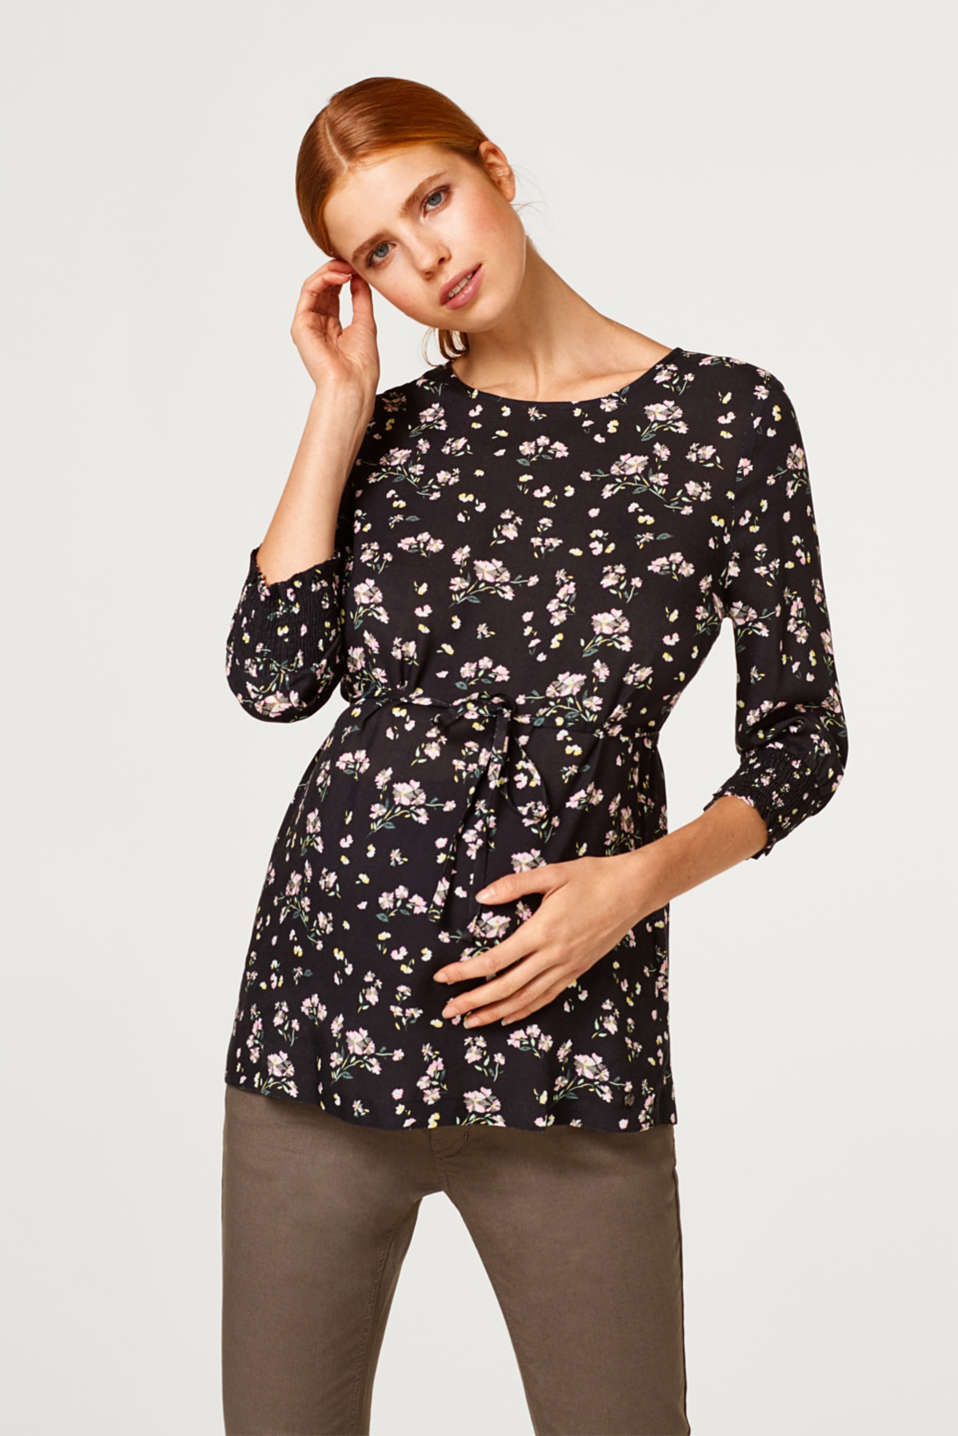 Printed blouse with smocked sleeves, LCBLACK, detail image number 0